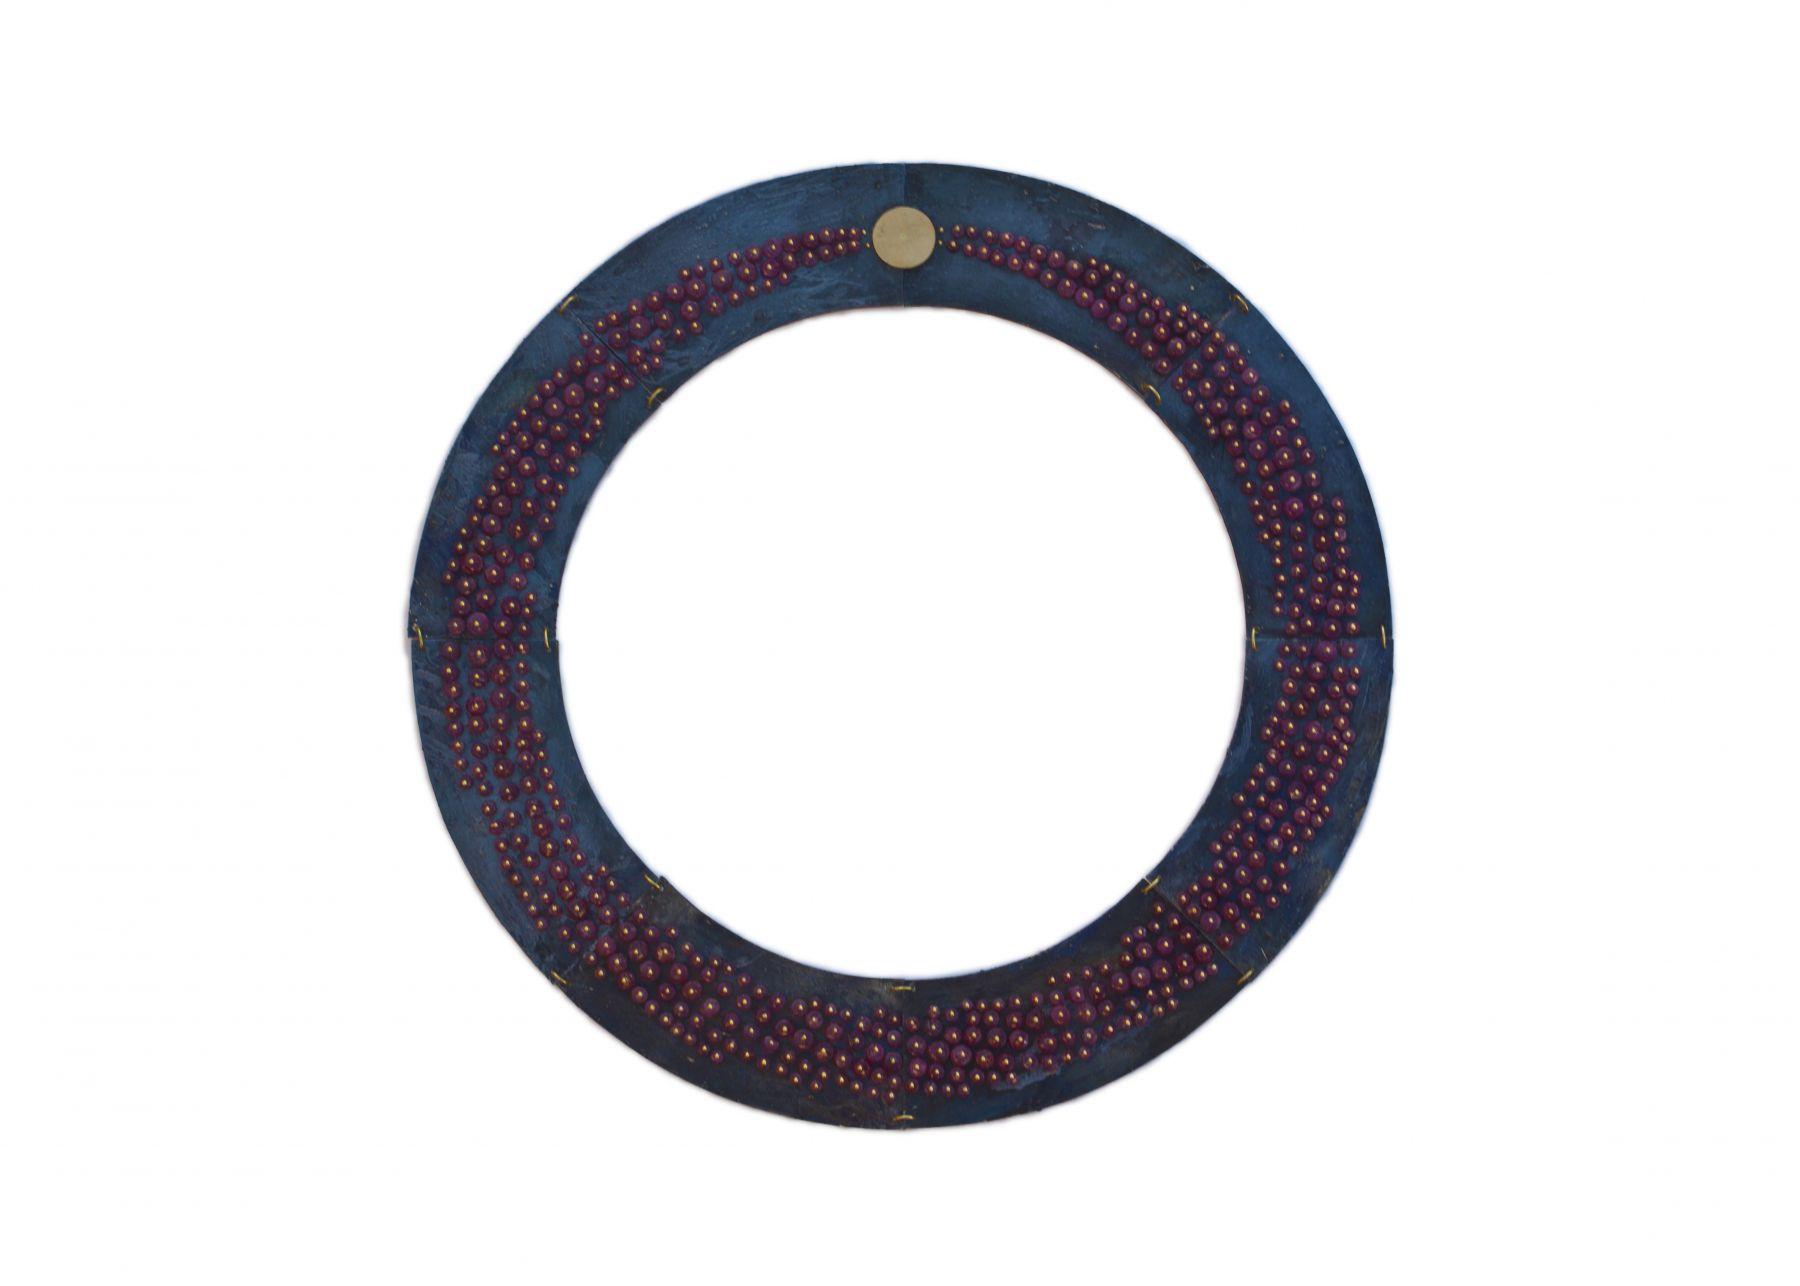 Philip Sajet, Dutch, contemporary jewelry, necklace